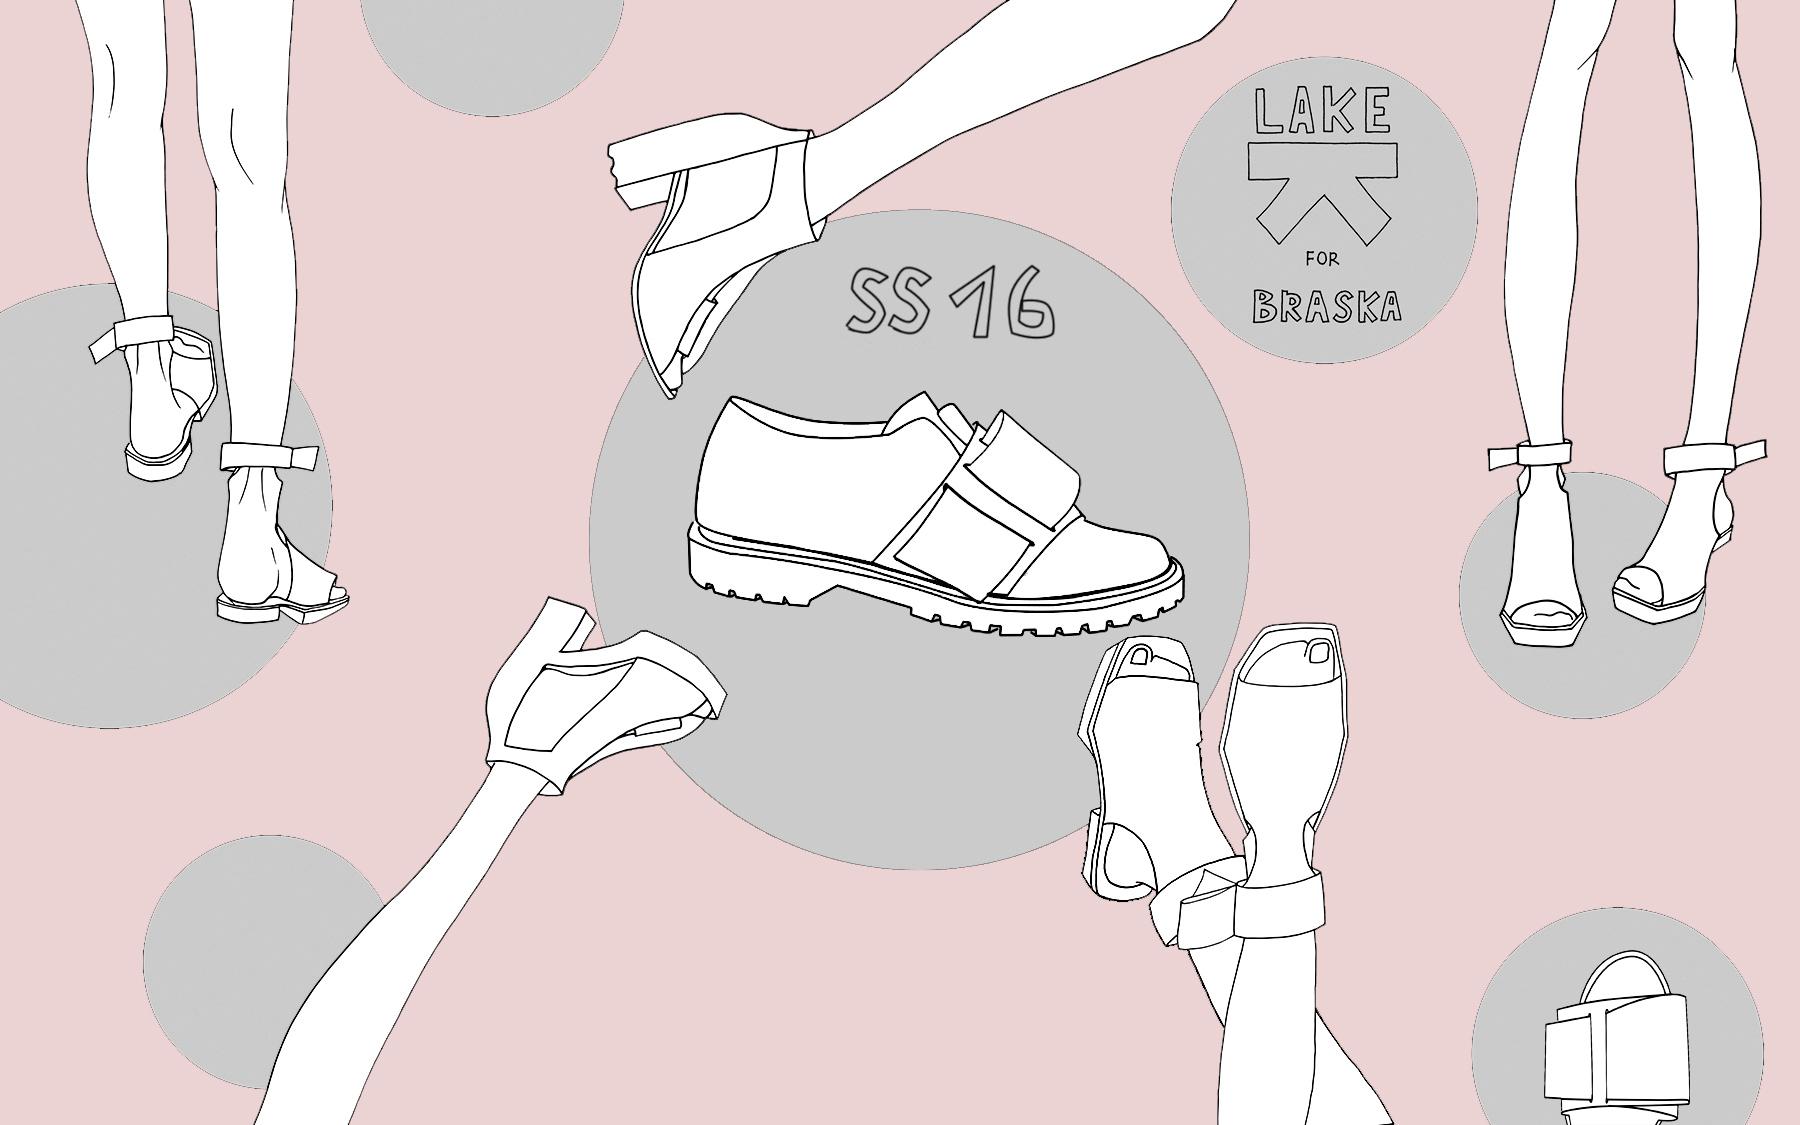 LAKE создали новую коллекцию обуви для Braska-320x180